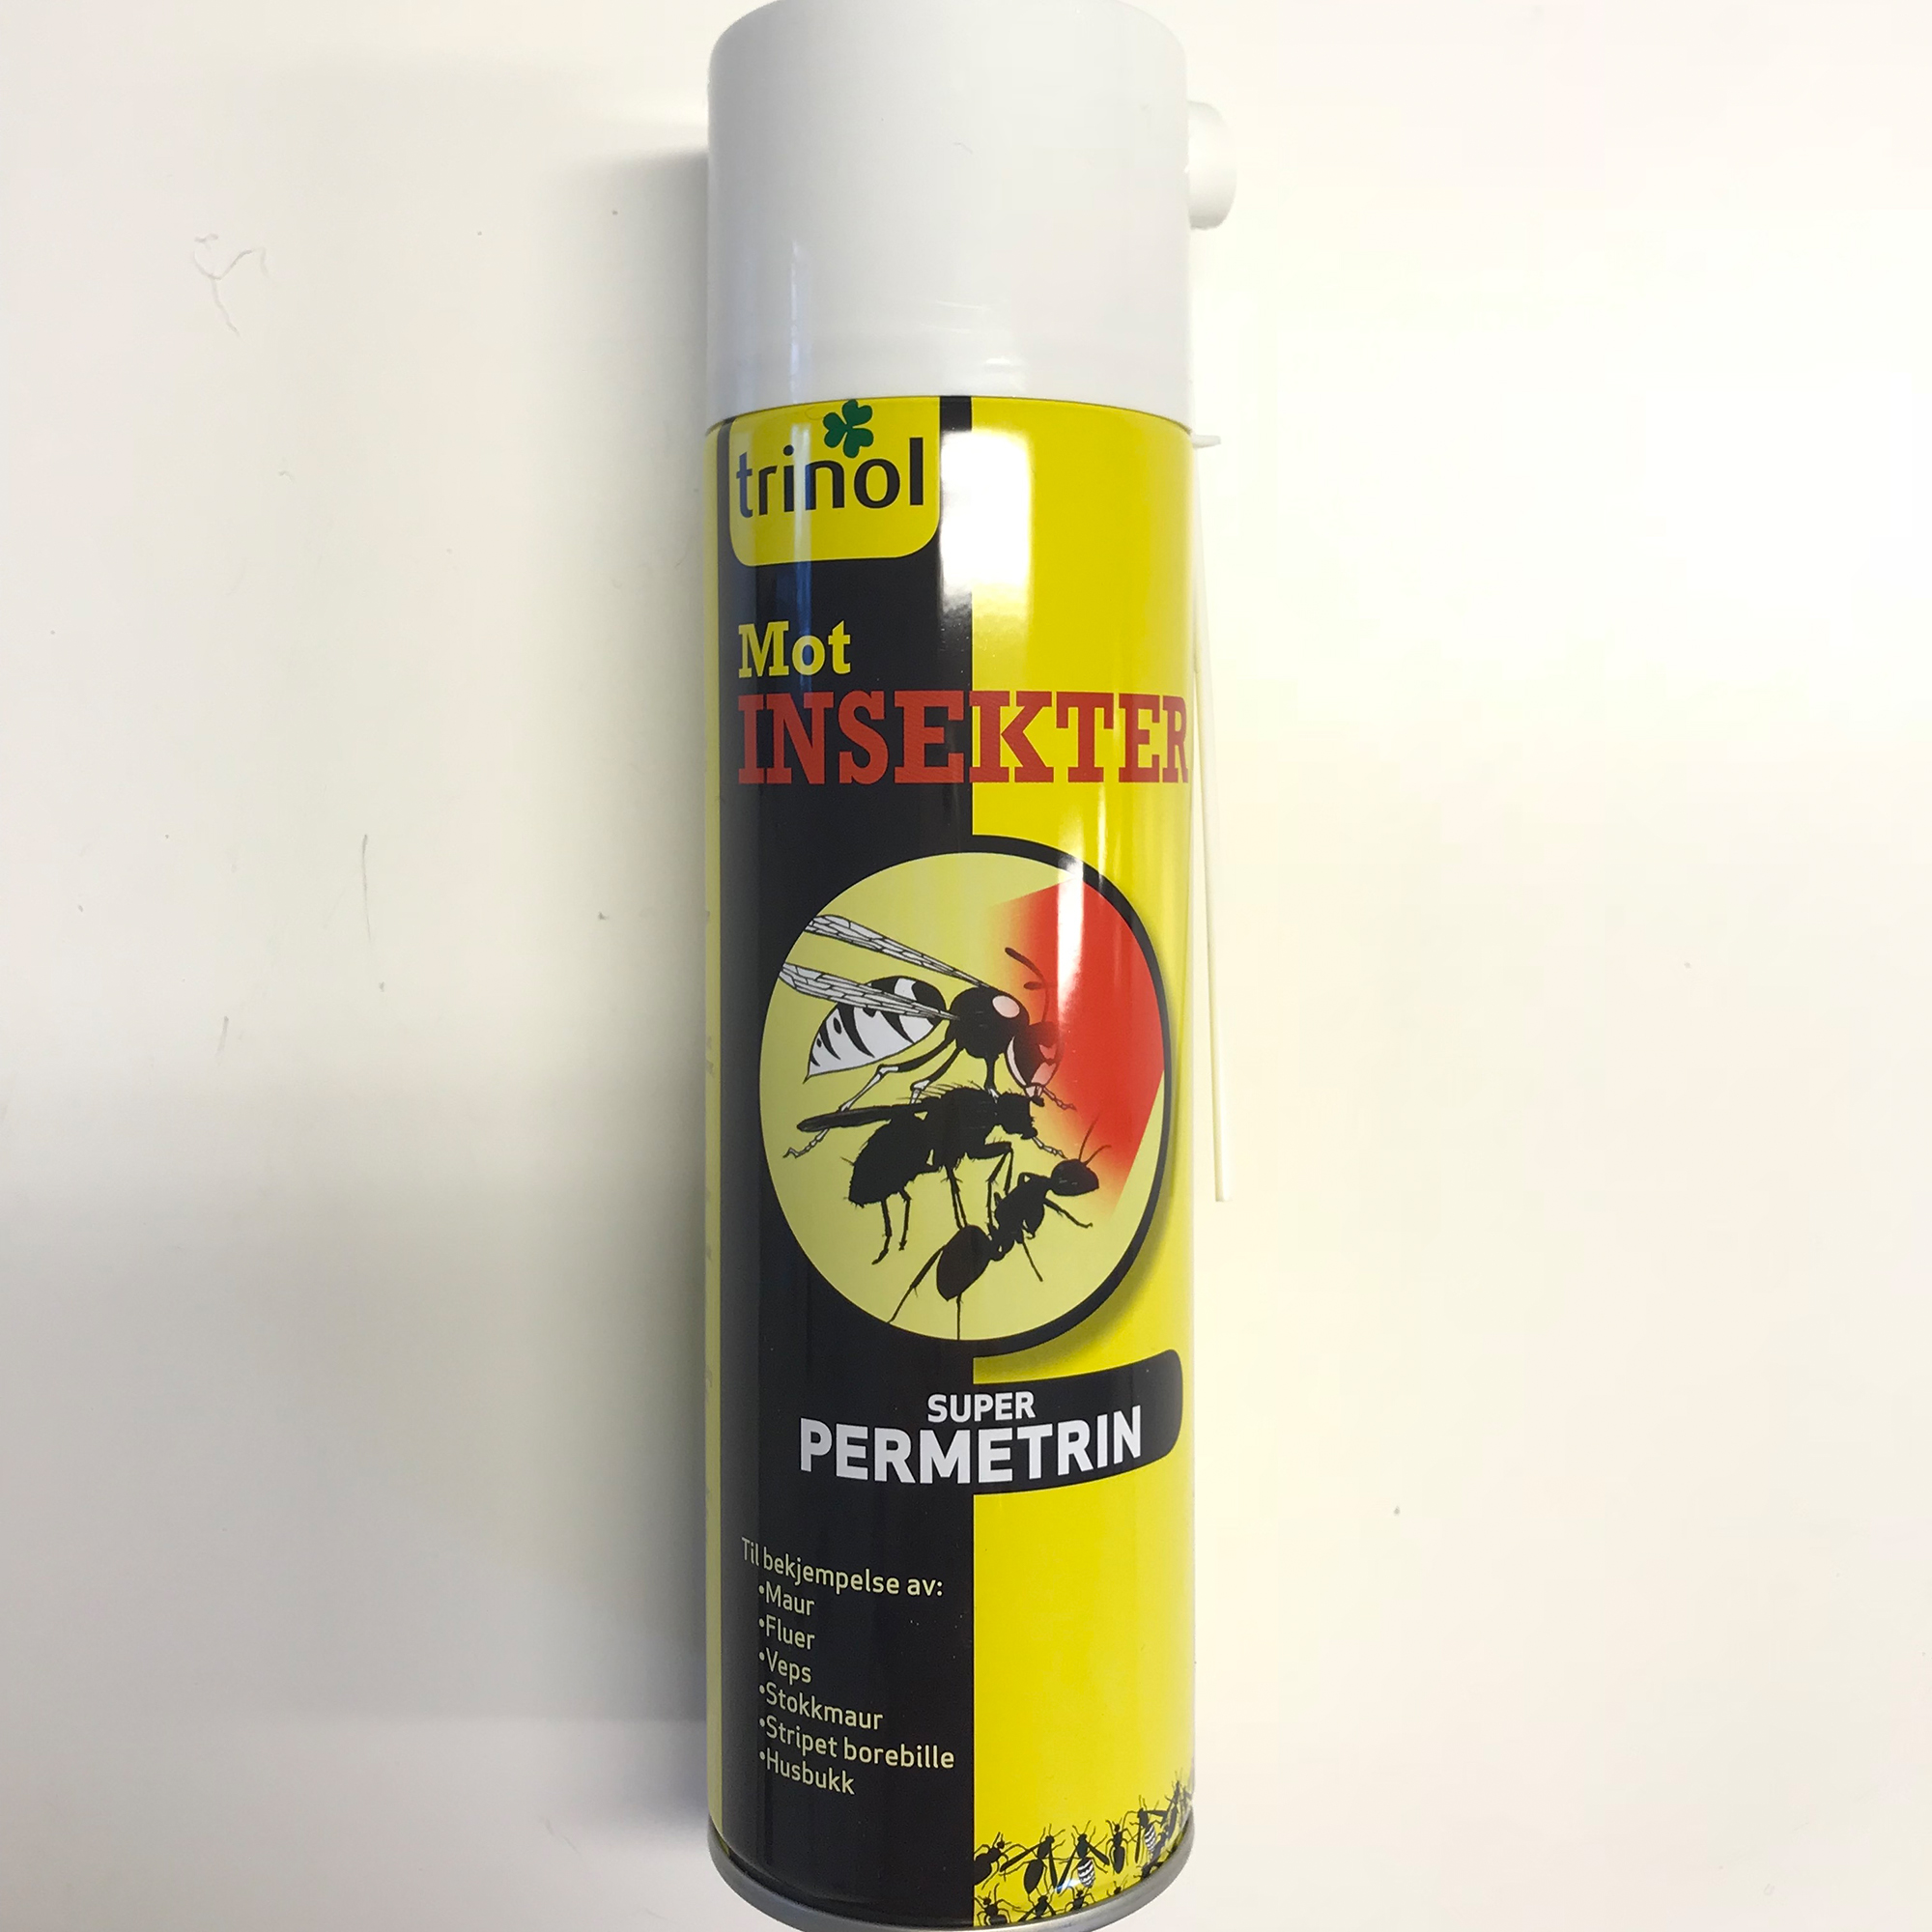 Trinol - Permetrin